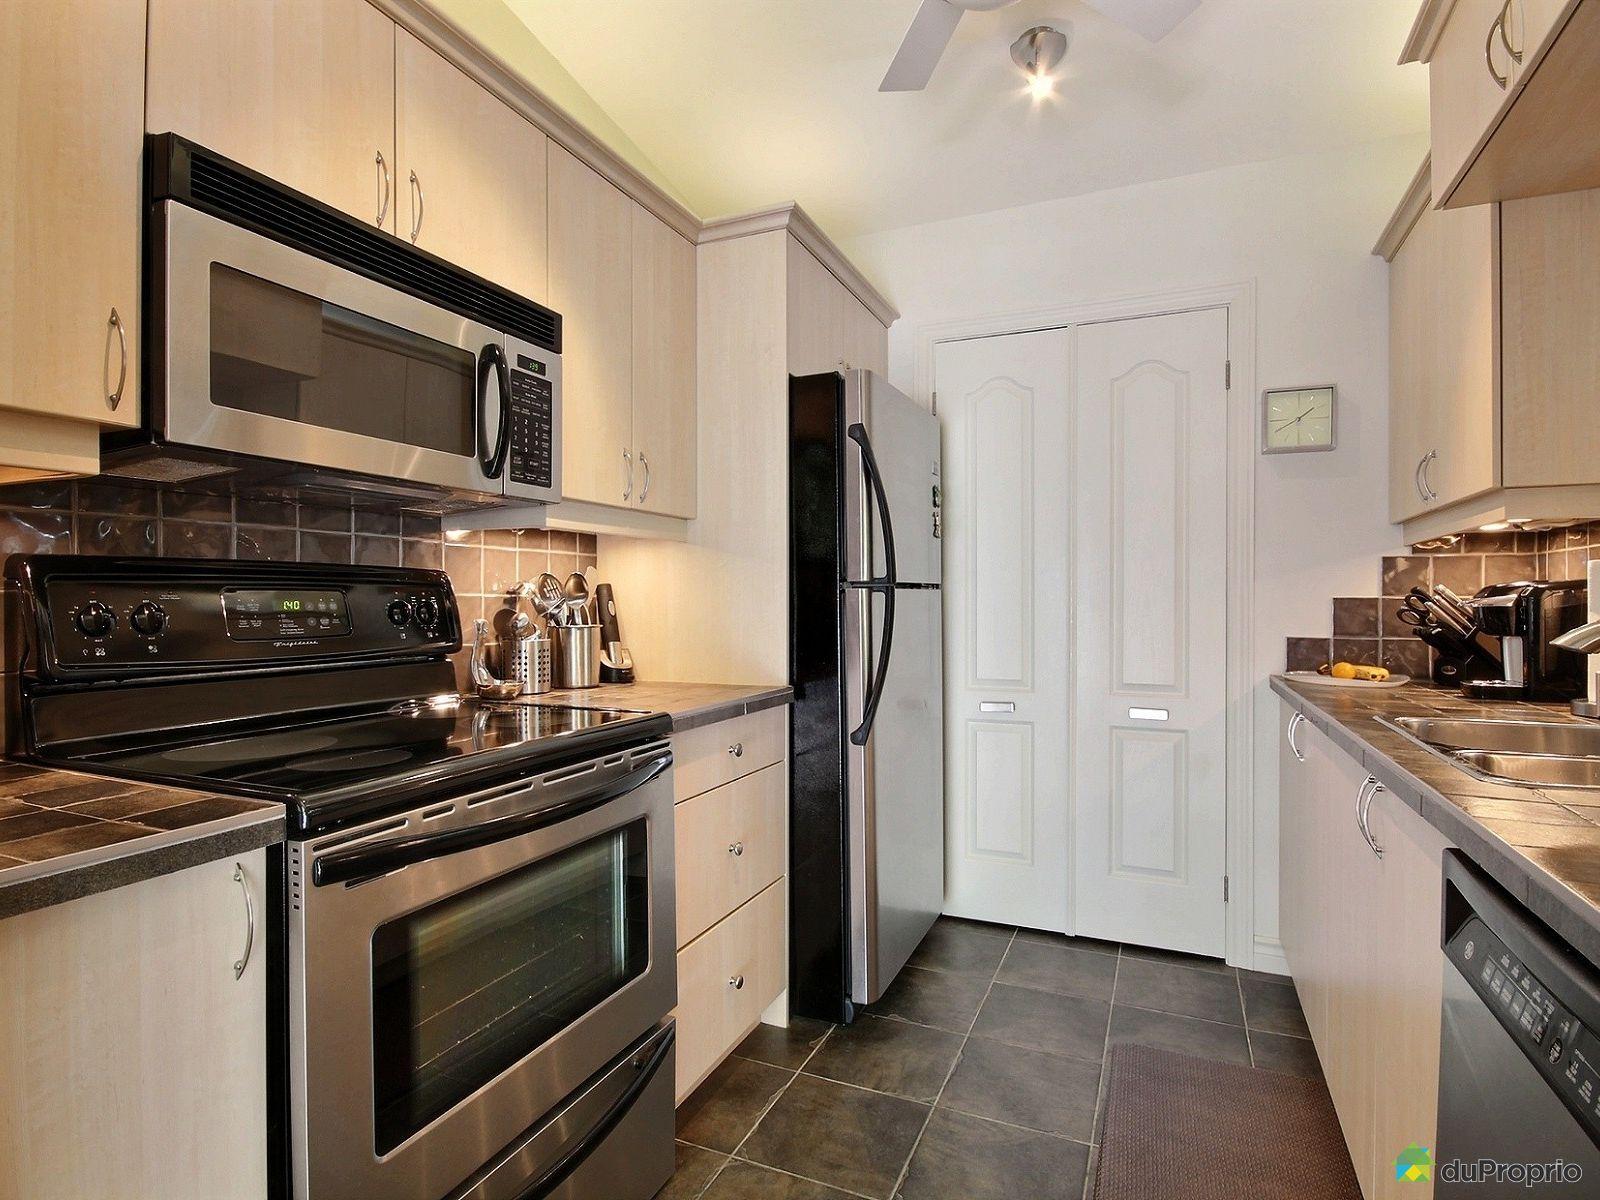 maison vendre venise en quebec 170 rue roger vanier immobilier qu bec duproprio 711861. Black Bedroom Furniture Sets. Home Design Ideas